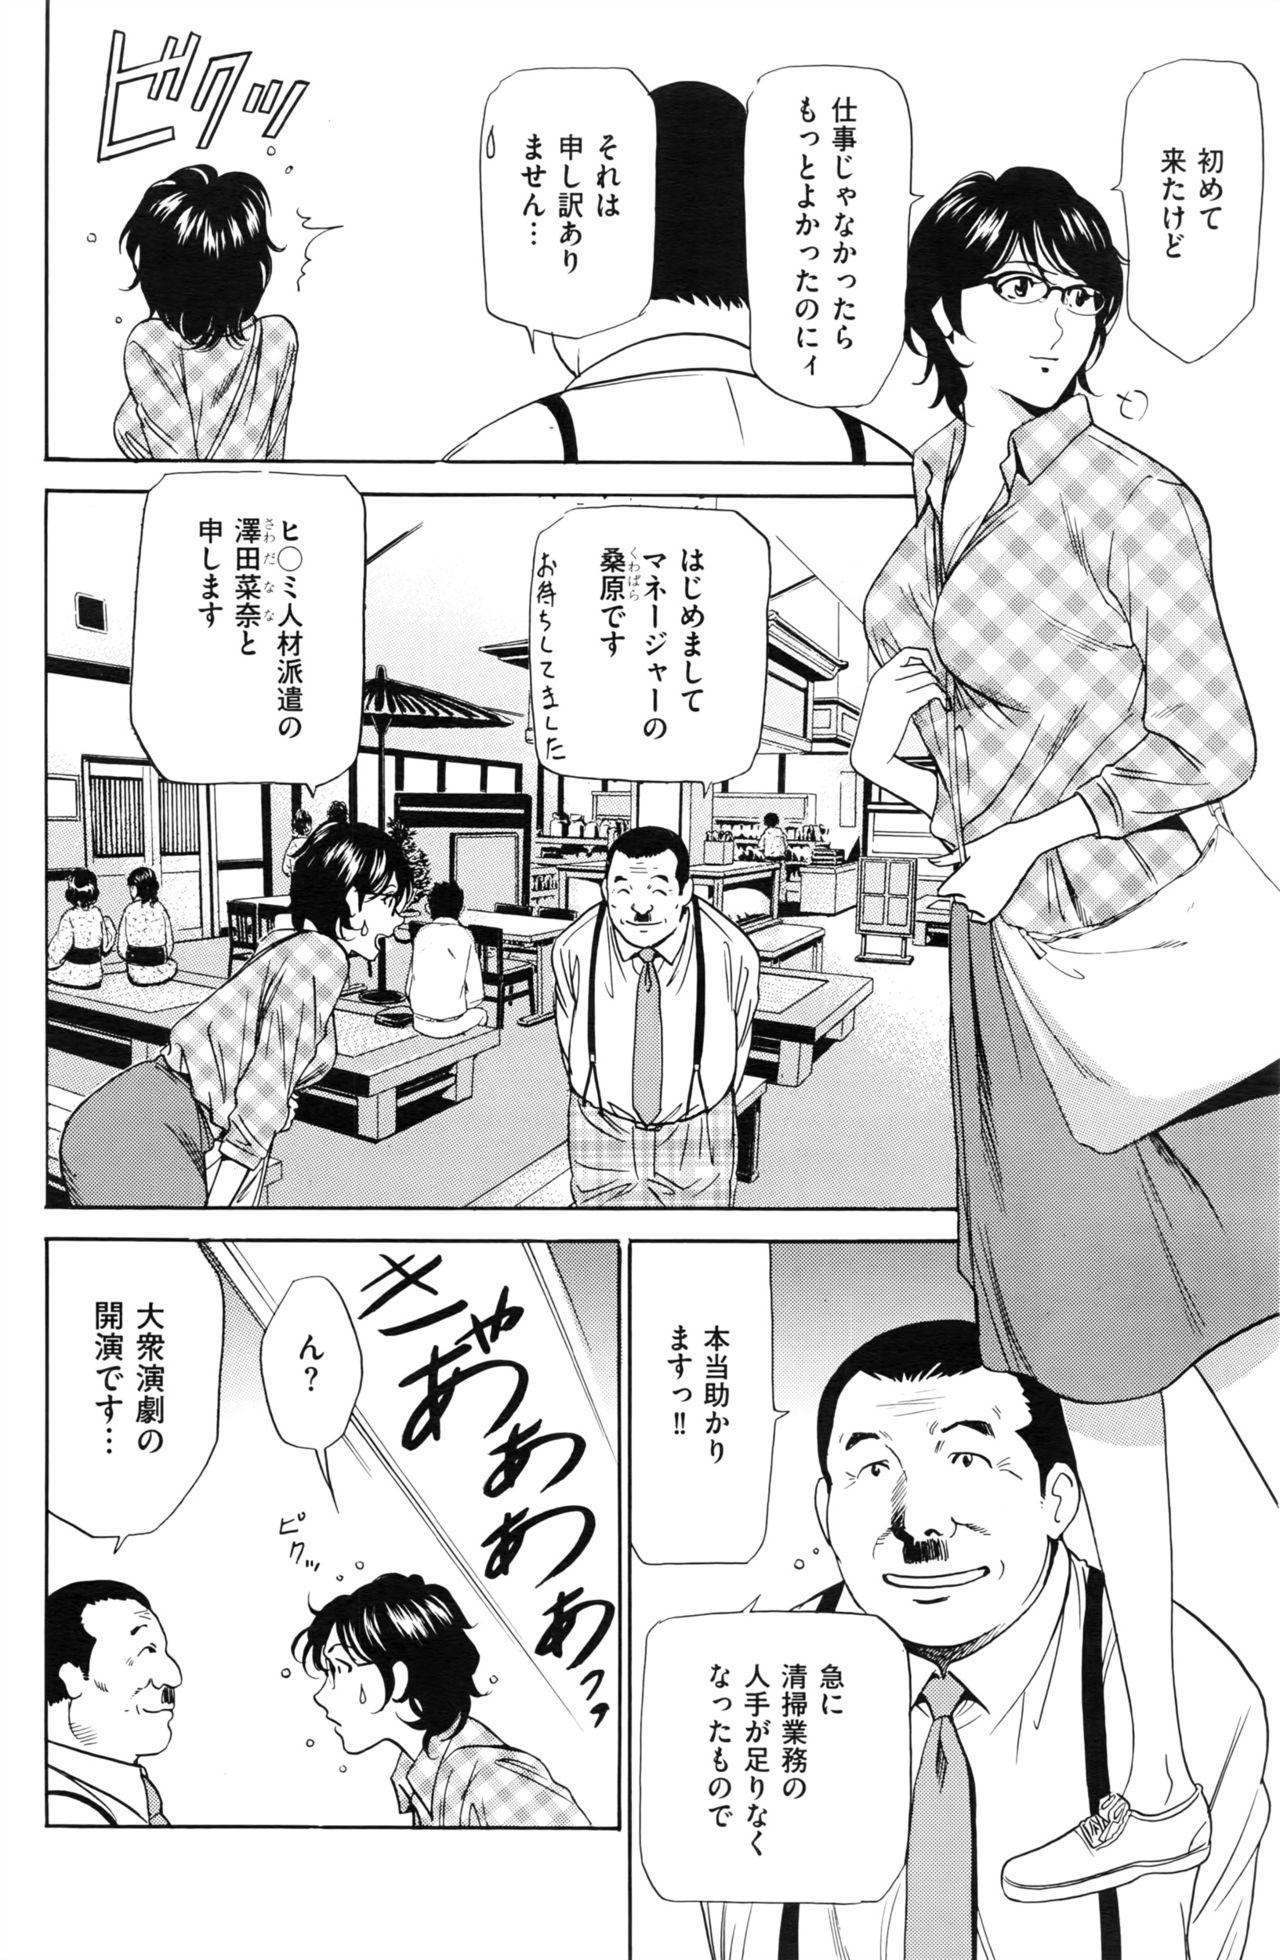 Wa Usuki Ipa a 1-10 56